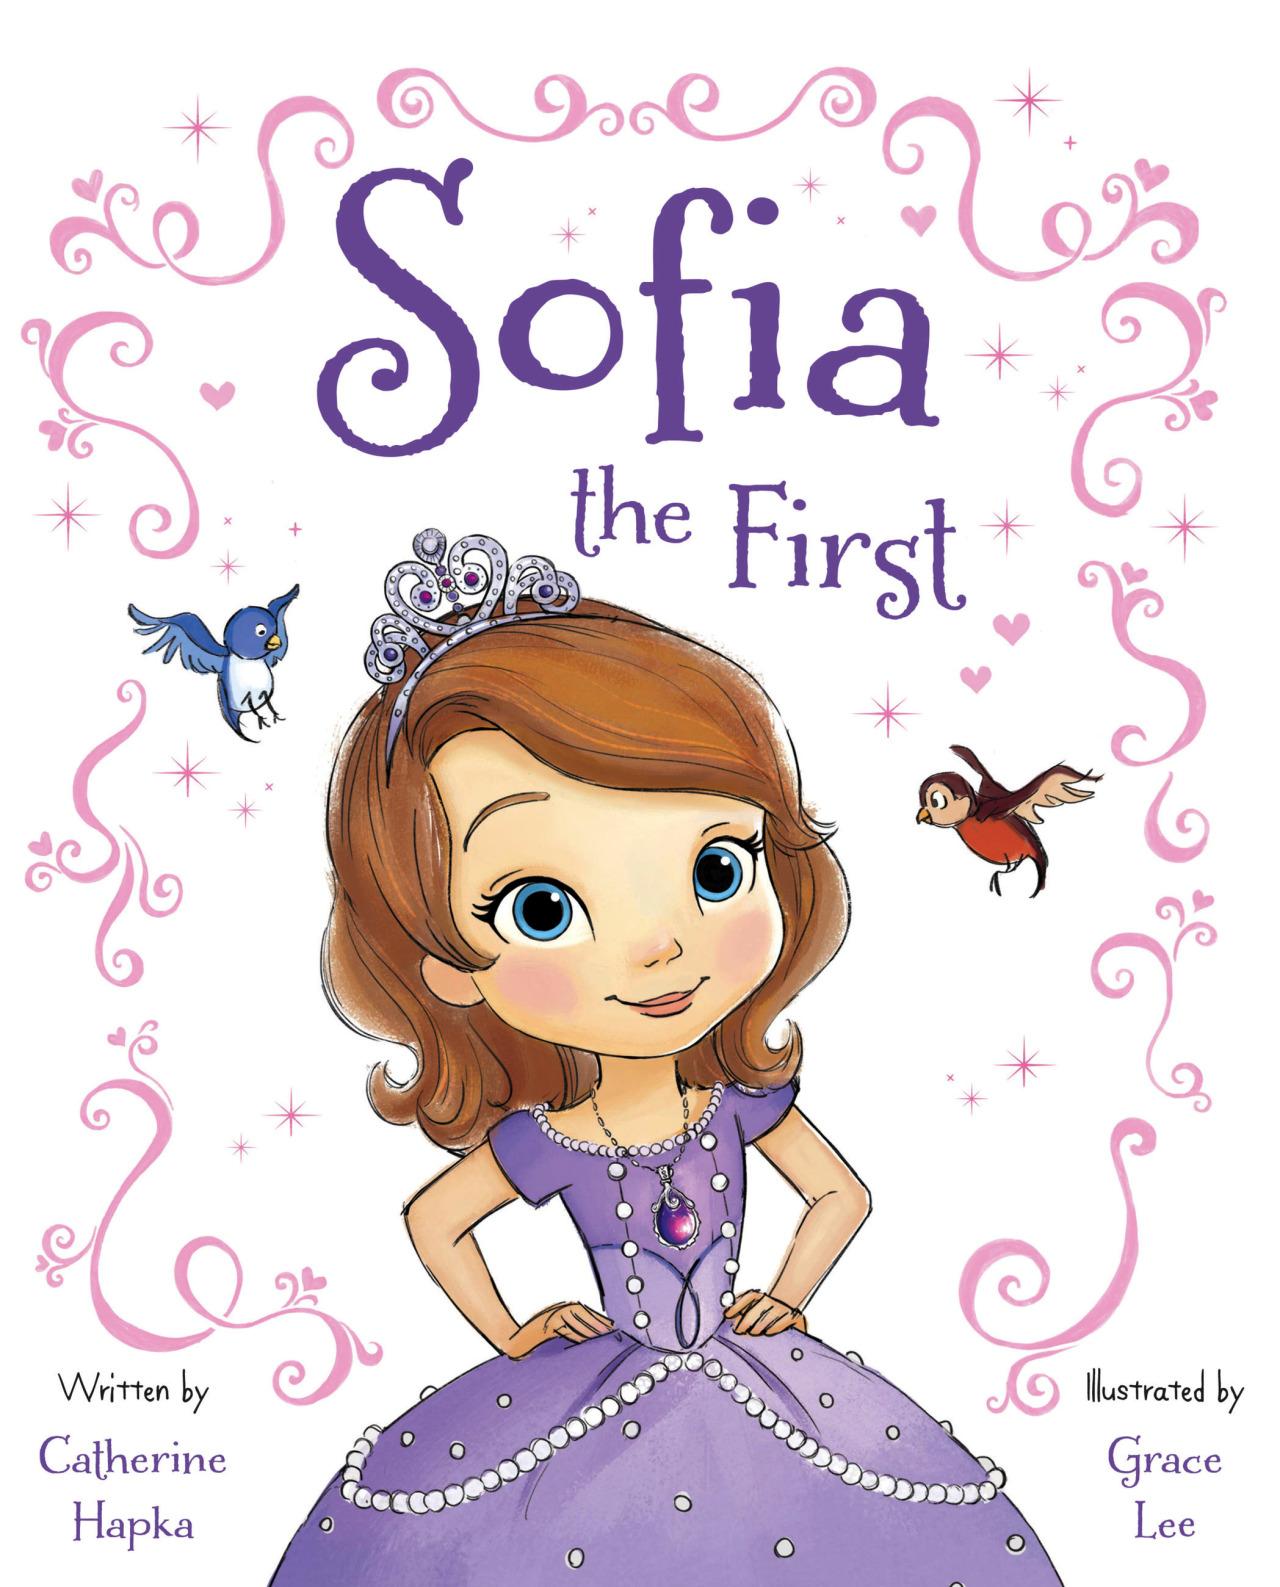 Disney princess sofia the first rather good